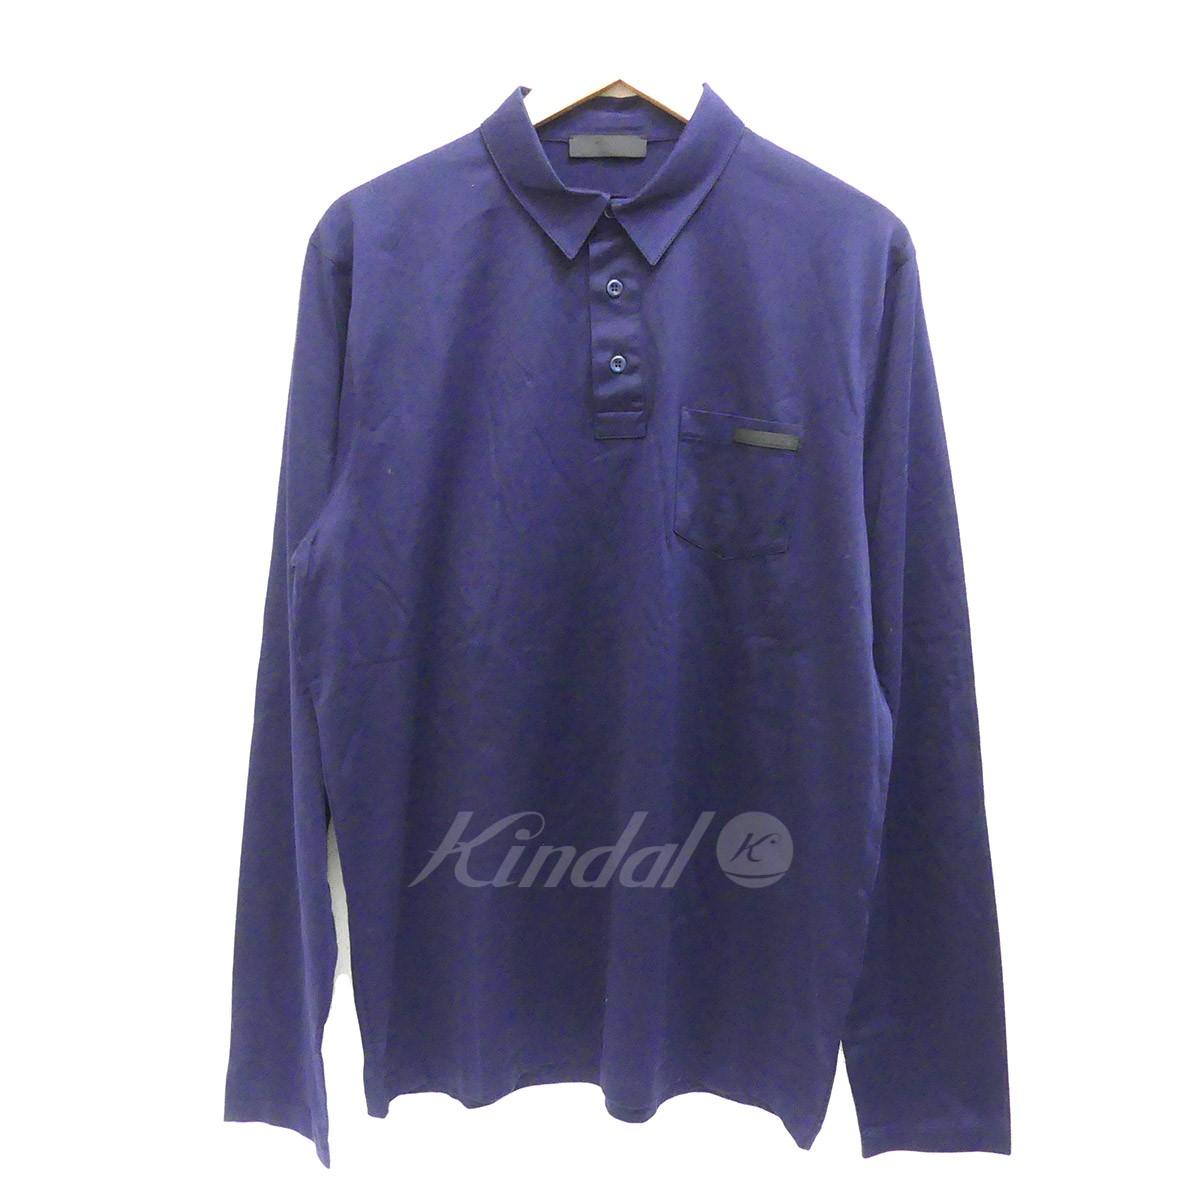 best service 819cd 55829 ロングスリーブポロシャツ 【中古】PRADA ネイビー 【100718 ...